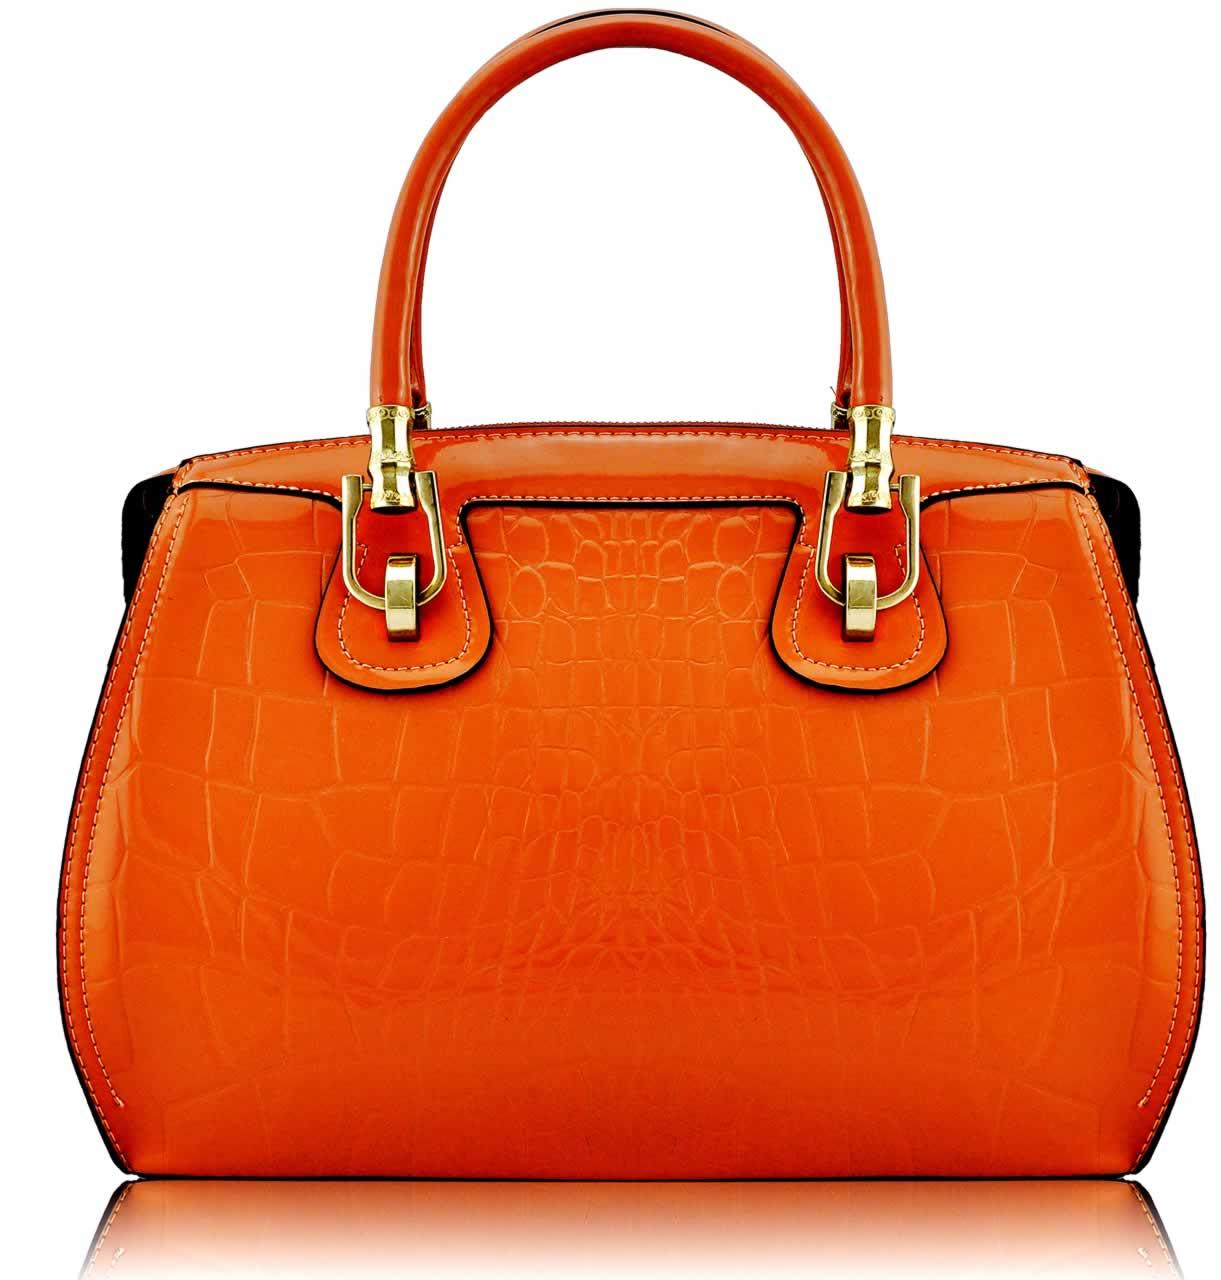 Home HANDBAGS LS0022 - Orange Croc Grab Bag